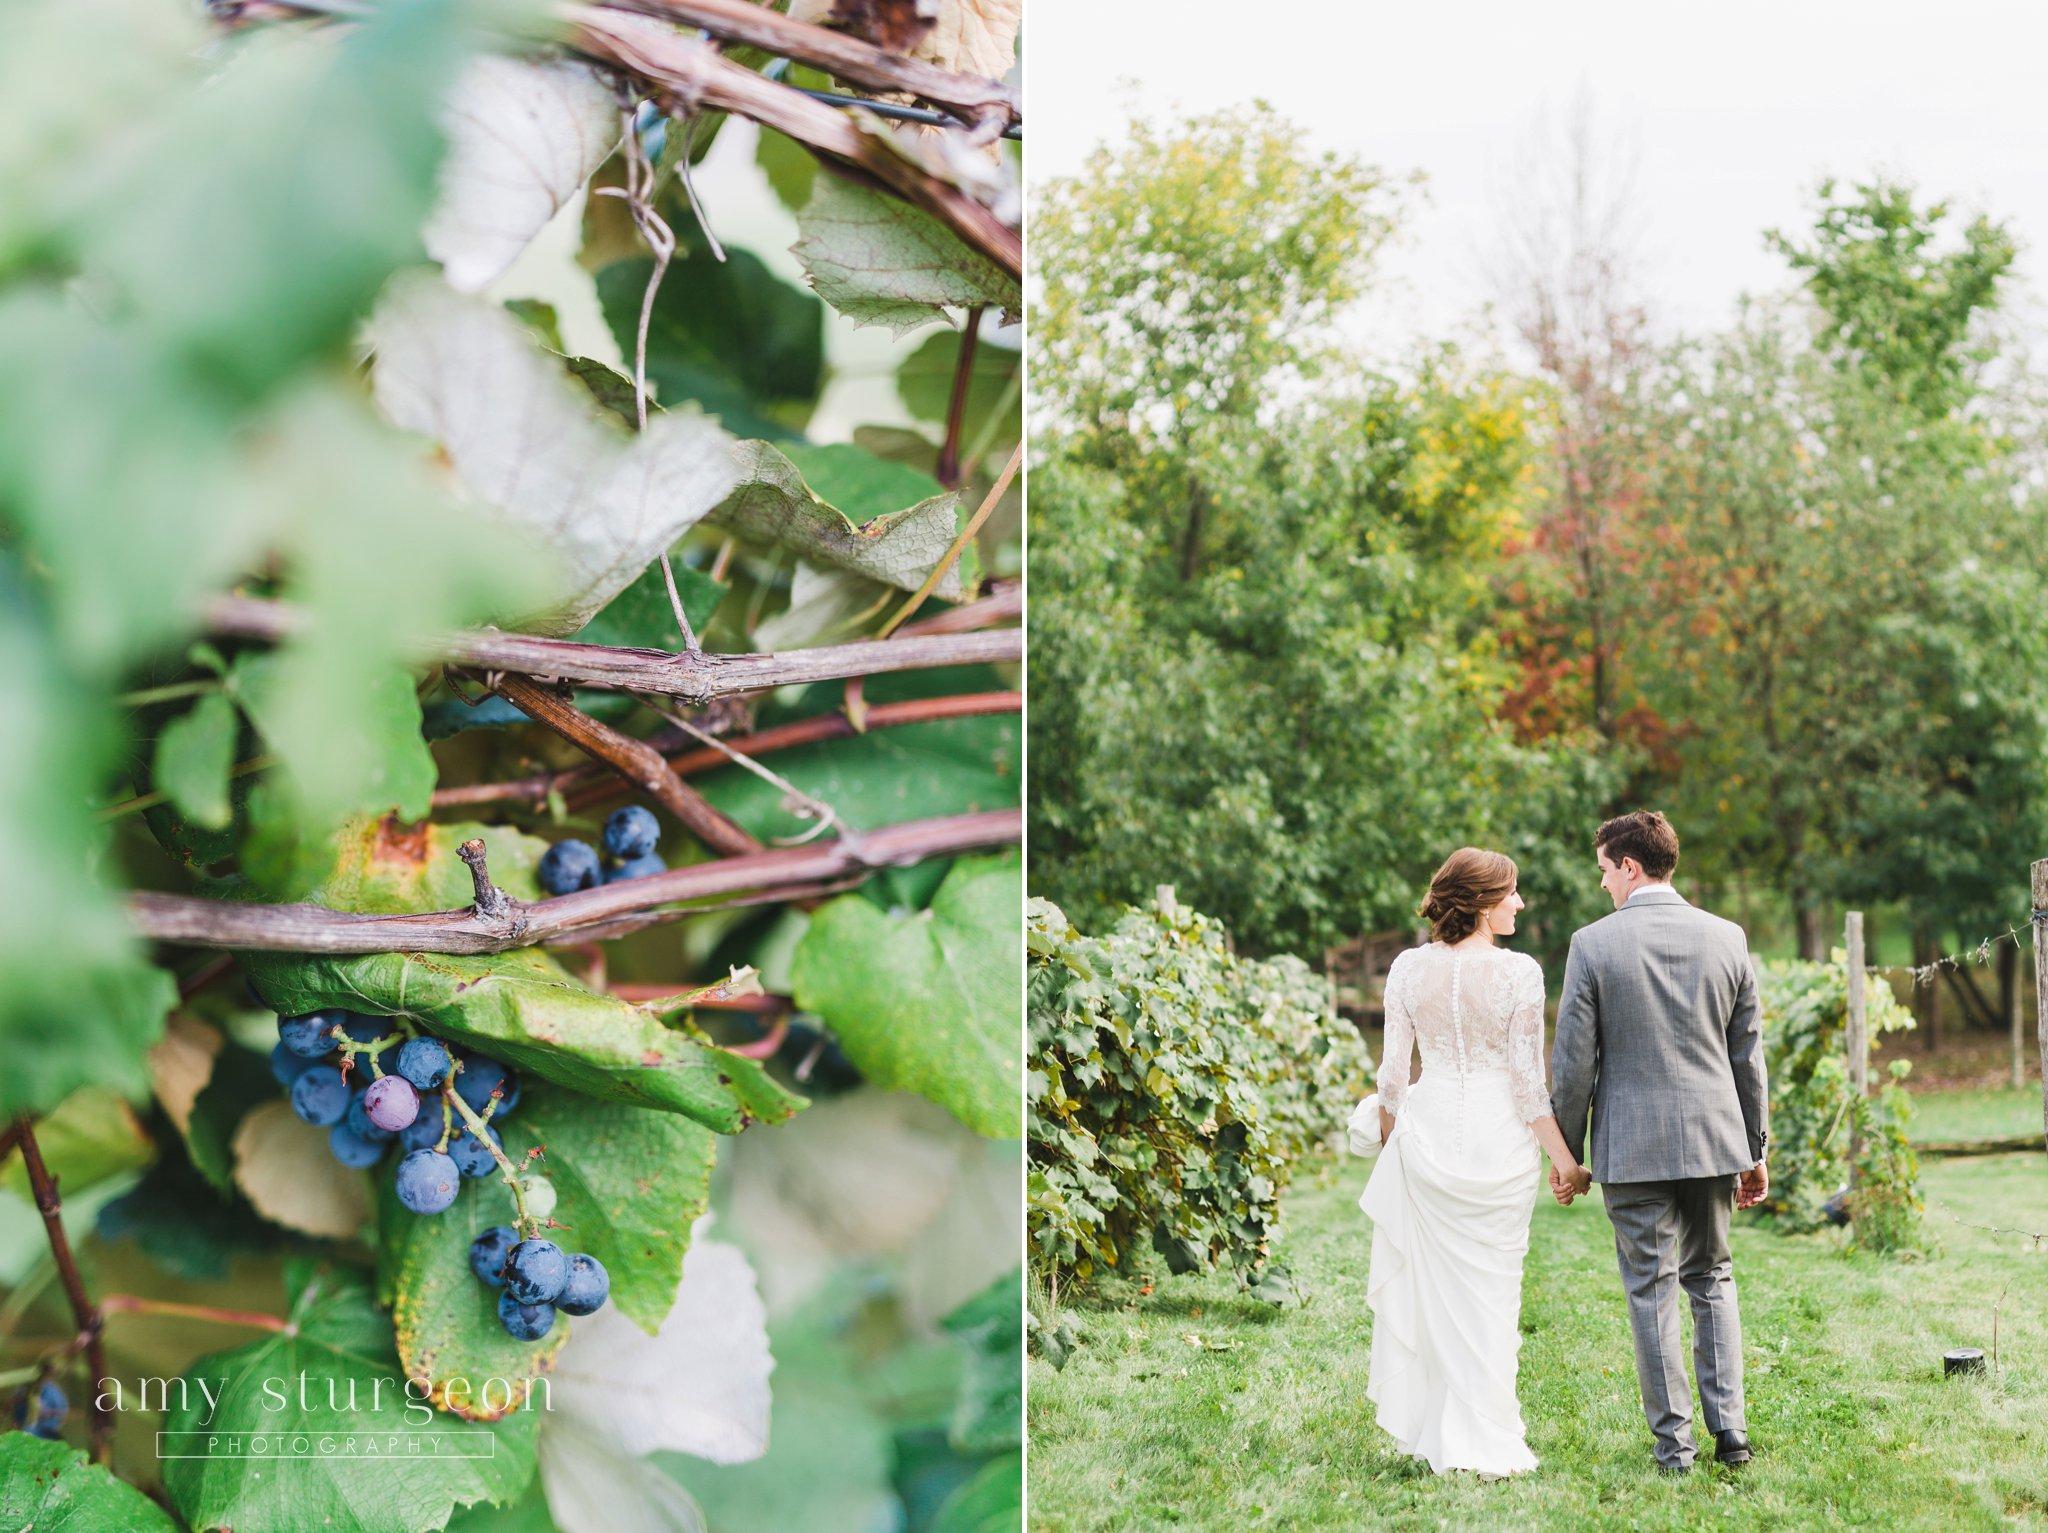 Vineyard wedding portraits at the alpaca farm wedding